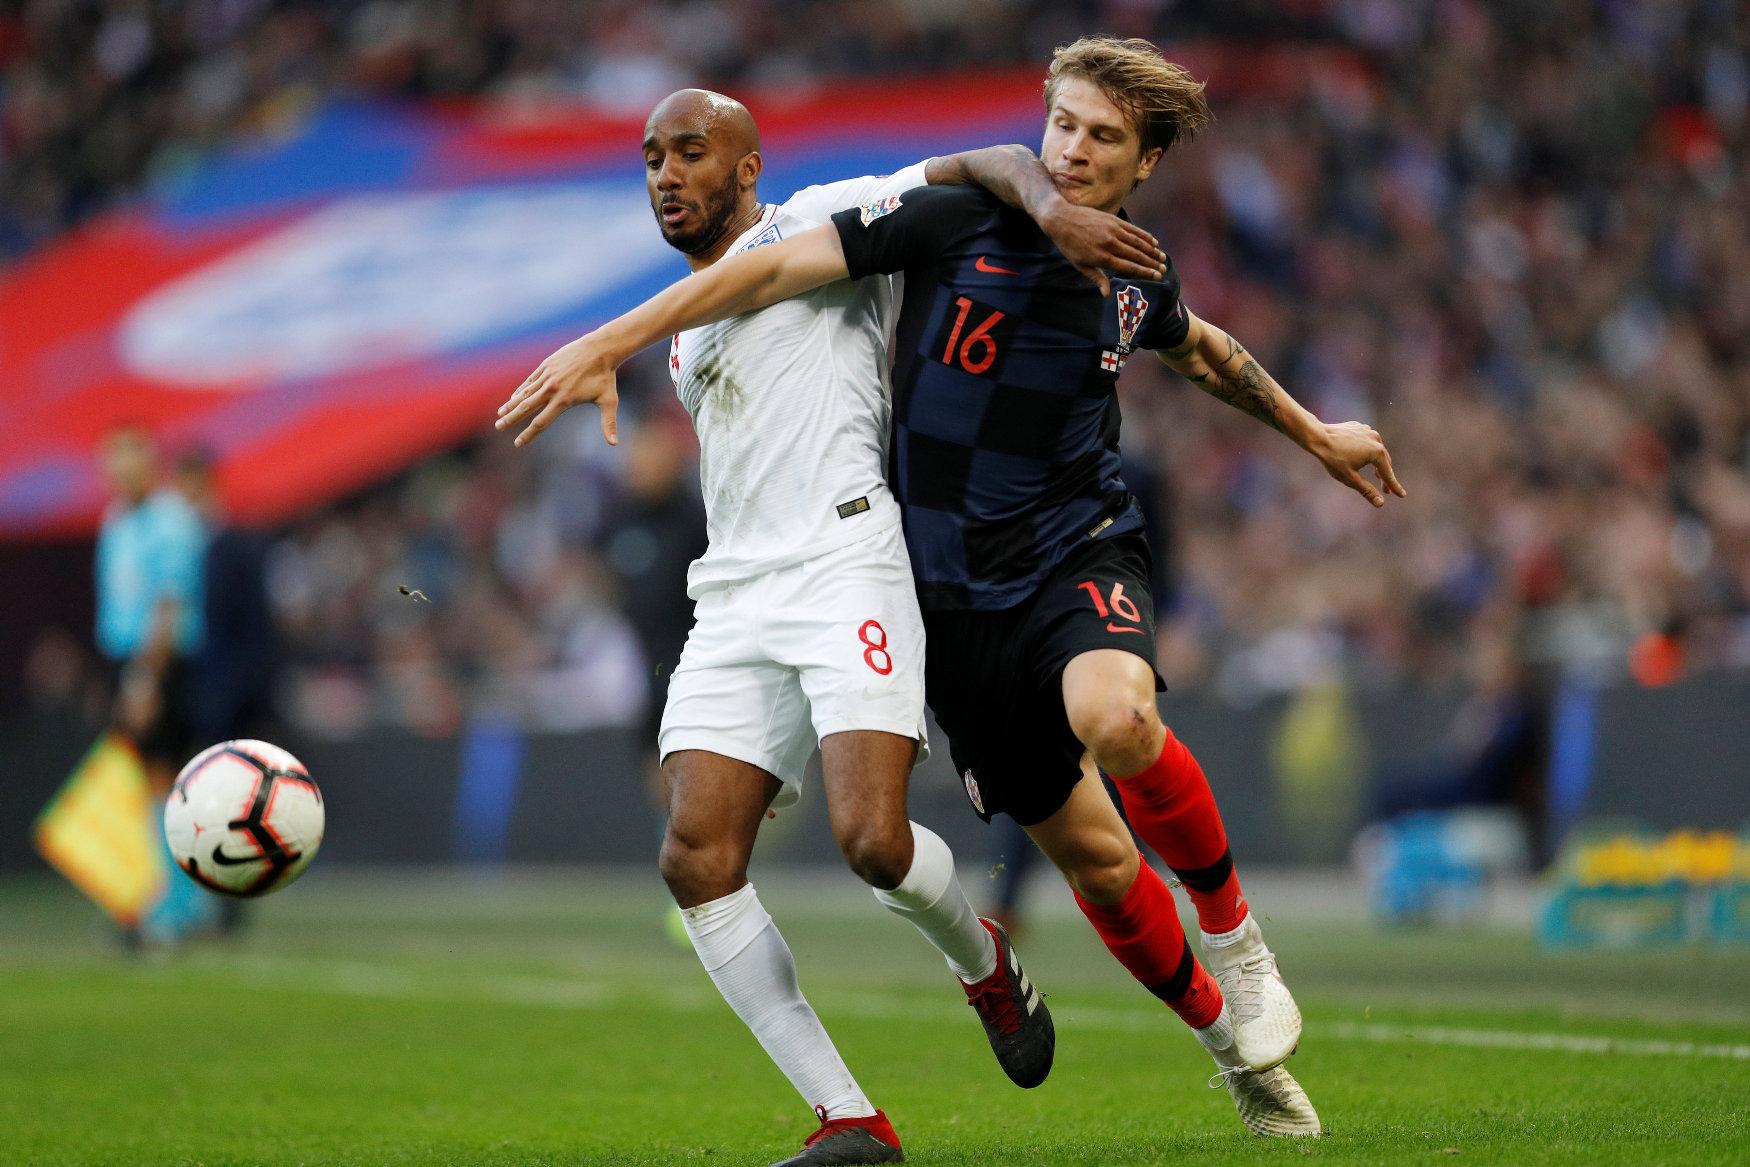 Soccer Football - UEFA Nations League - League A - Group 4 - England v Croatia - Wembley Stadium, London, Britain - November 18, 2018  England's Fabian Delph in action with Croatia's Tin Jedvaj        REUTERS/Darren Staples